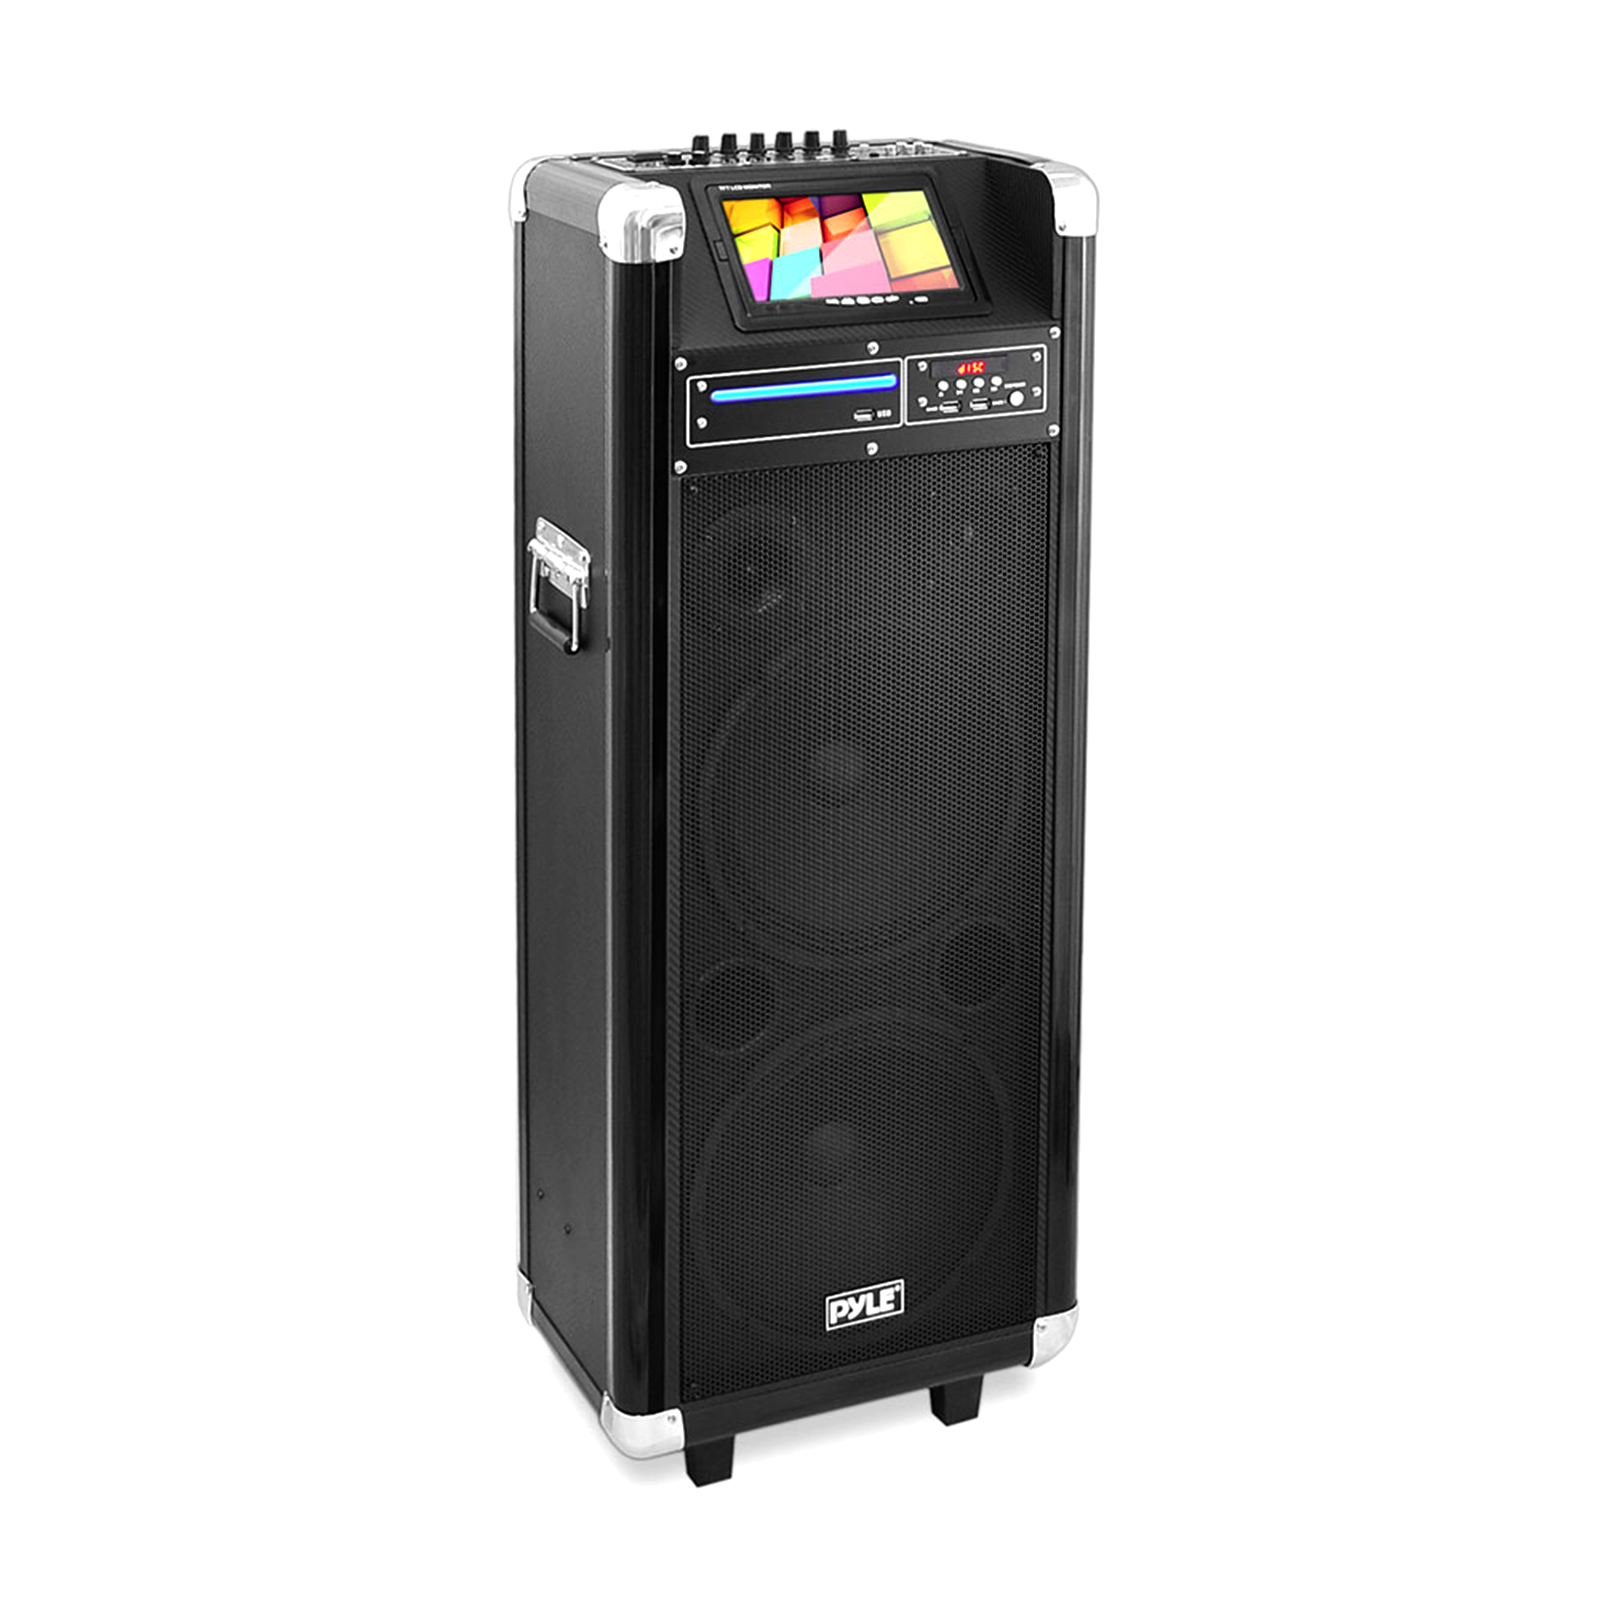 "Karaoke Vibe BT Multimedia PA System with 10"" Woofer, 7"" Screen, Multimedia Disc Player, VHF Microphone, 1000 Watt"